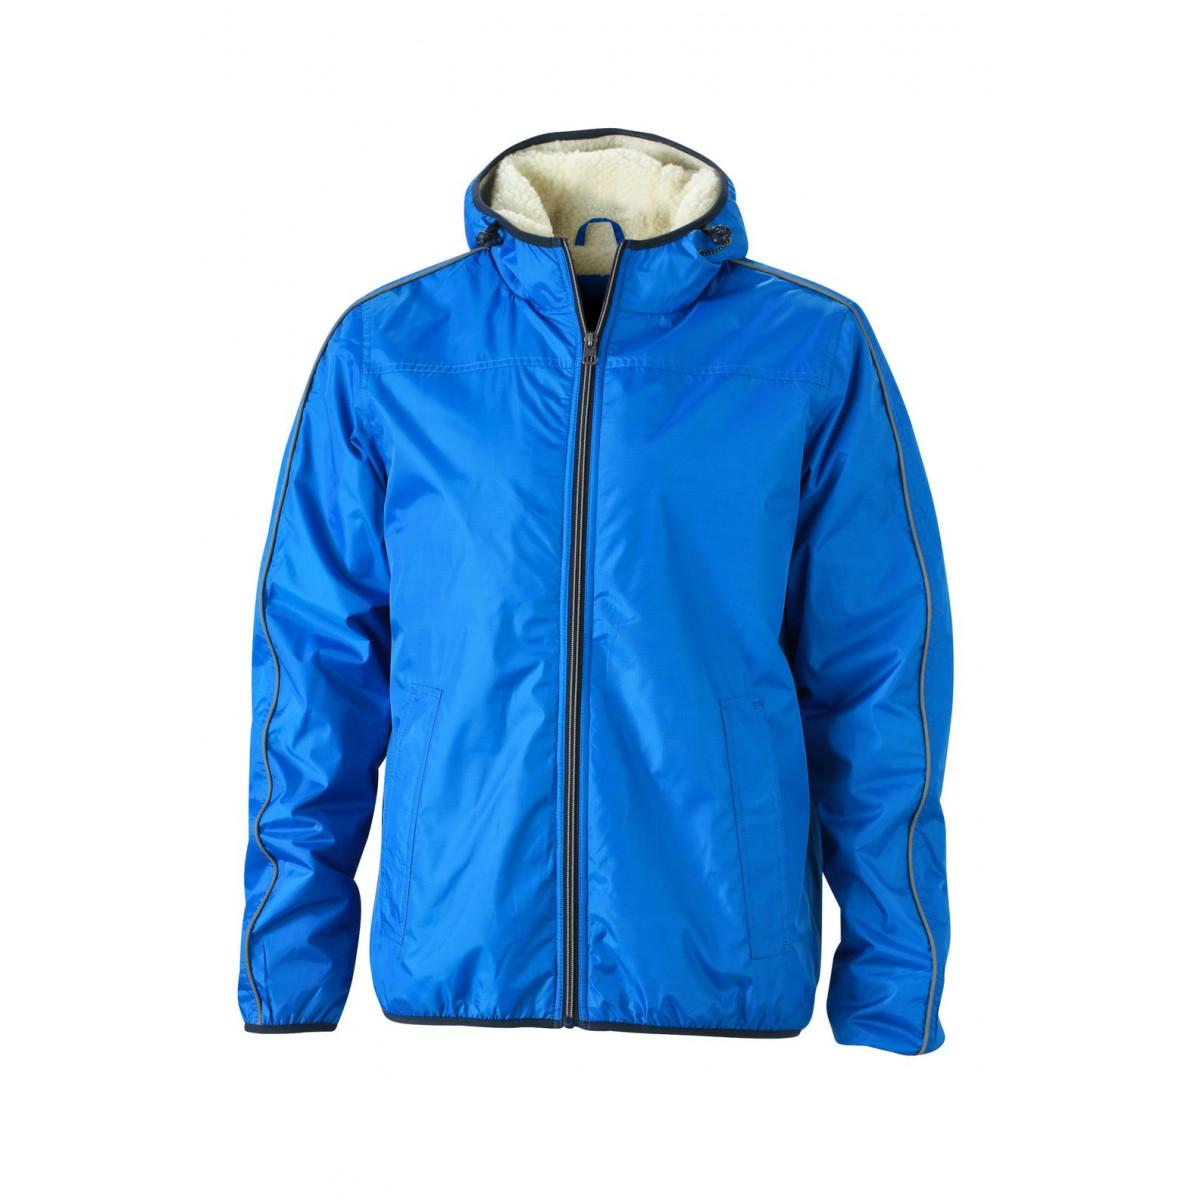 Куртка мужская JN1104 Mens Winter Sports Jacket - Ярко-синий/Белый